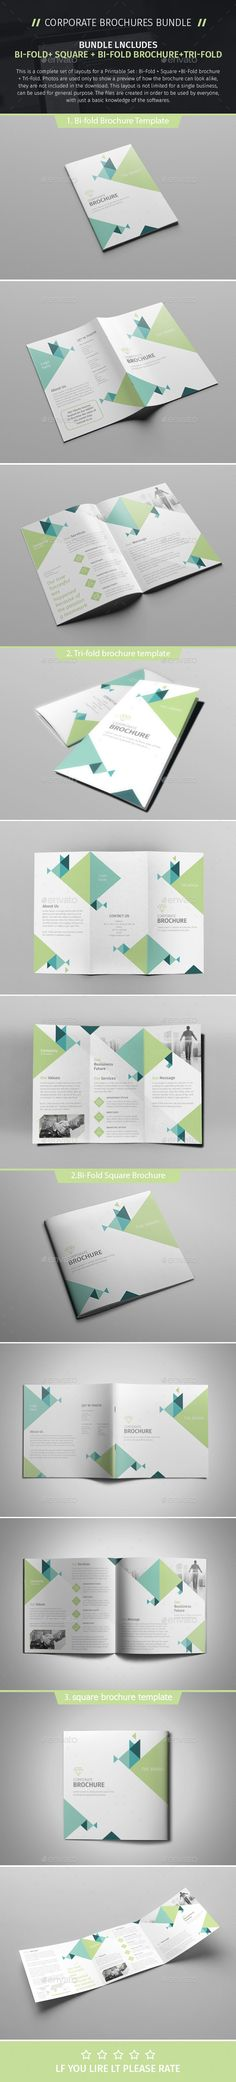 Brochure Bundle 08  — PSD Template #ad #corporate • Download ➝…                                                                                                                                                                                 More